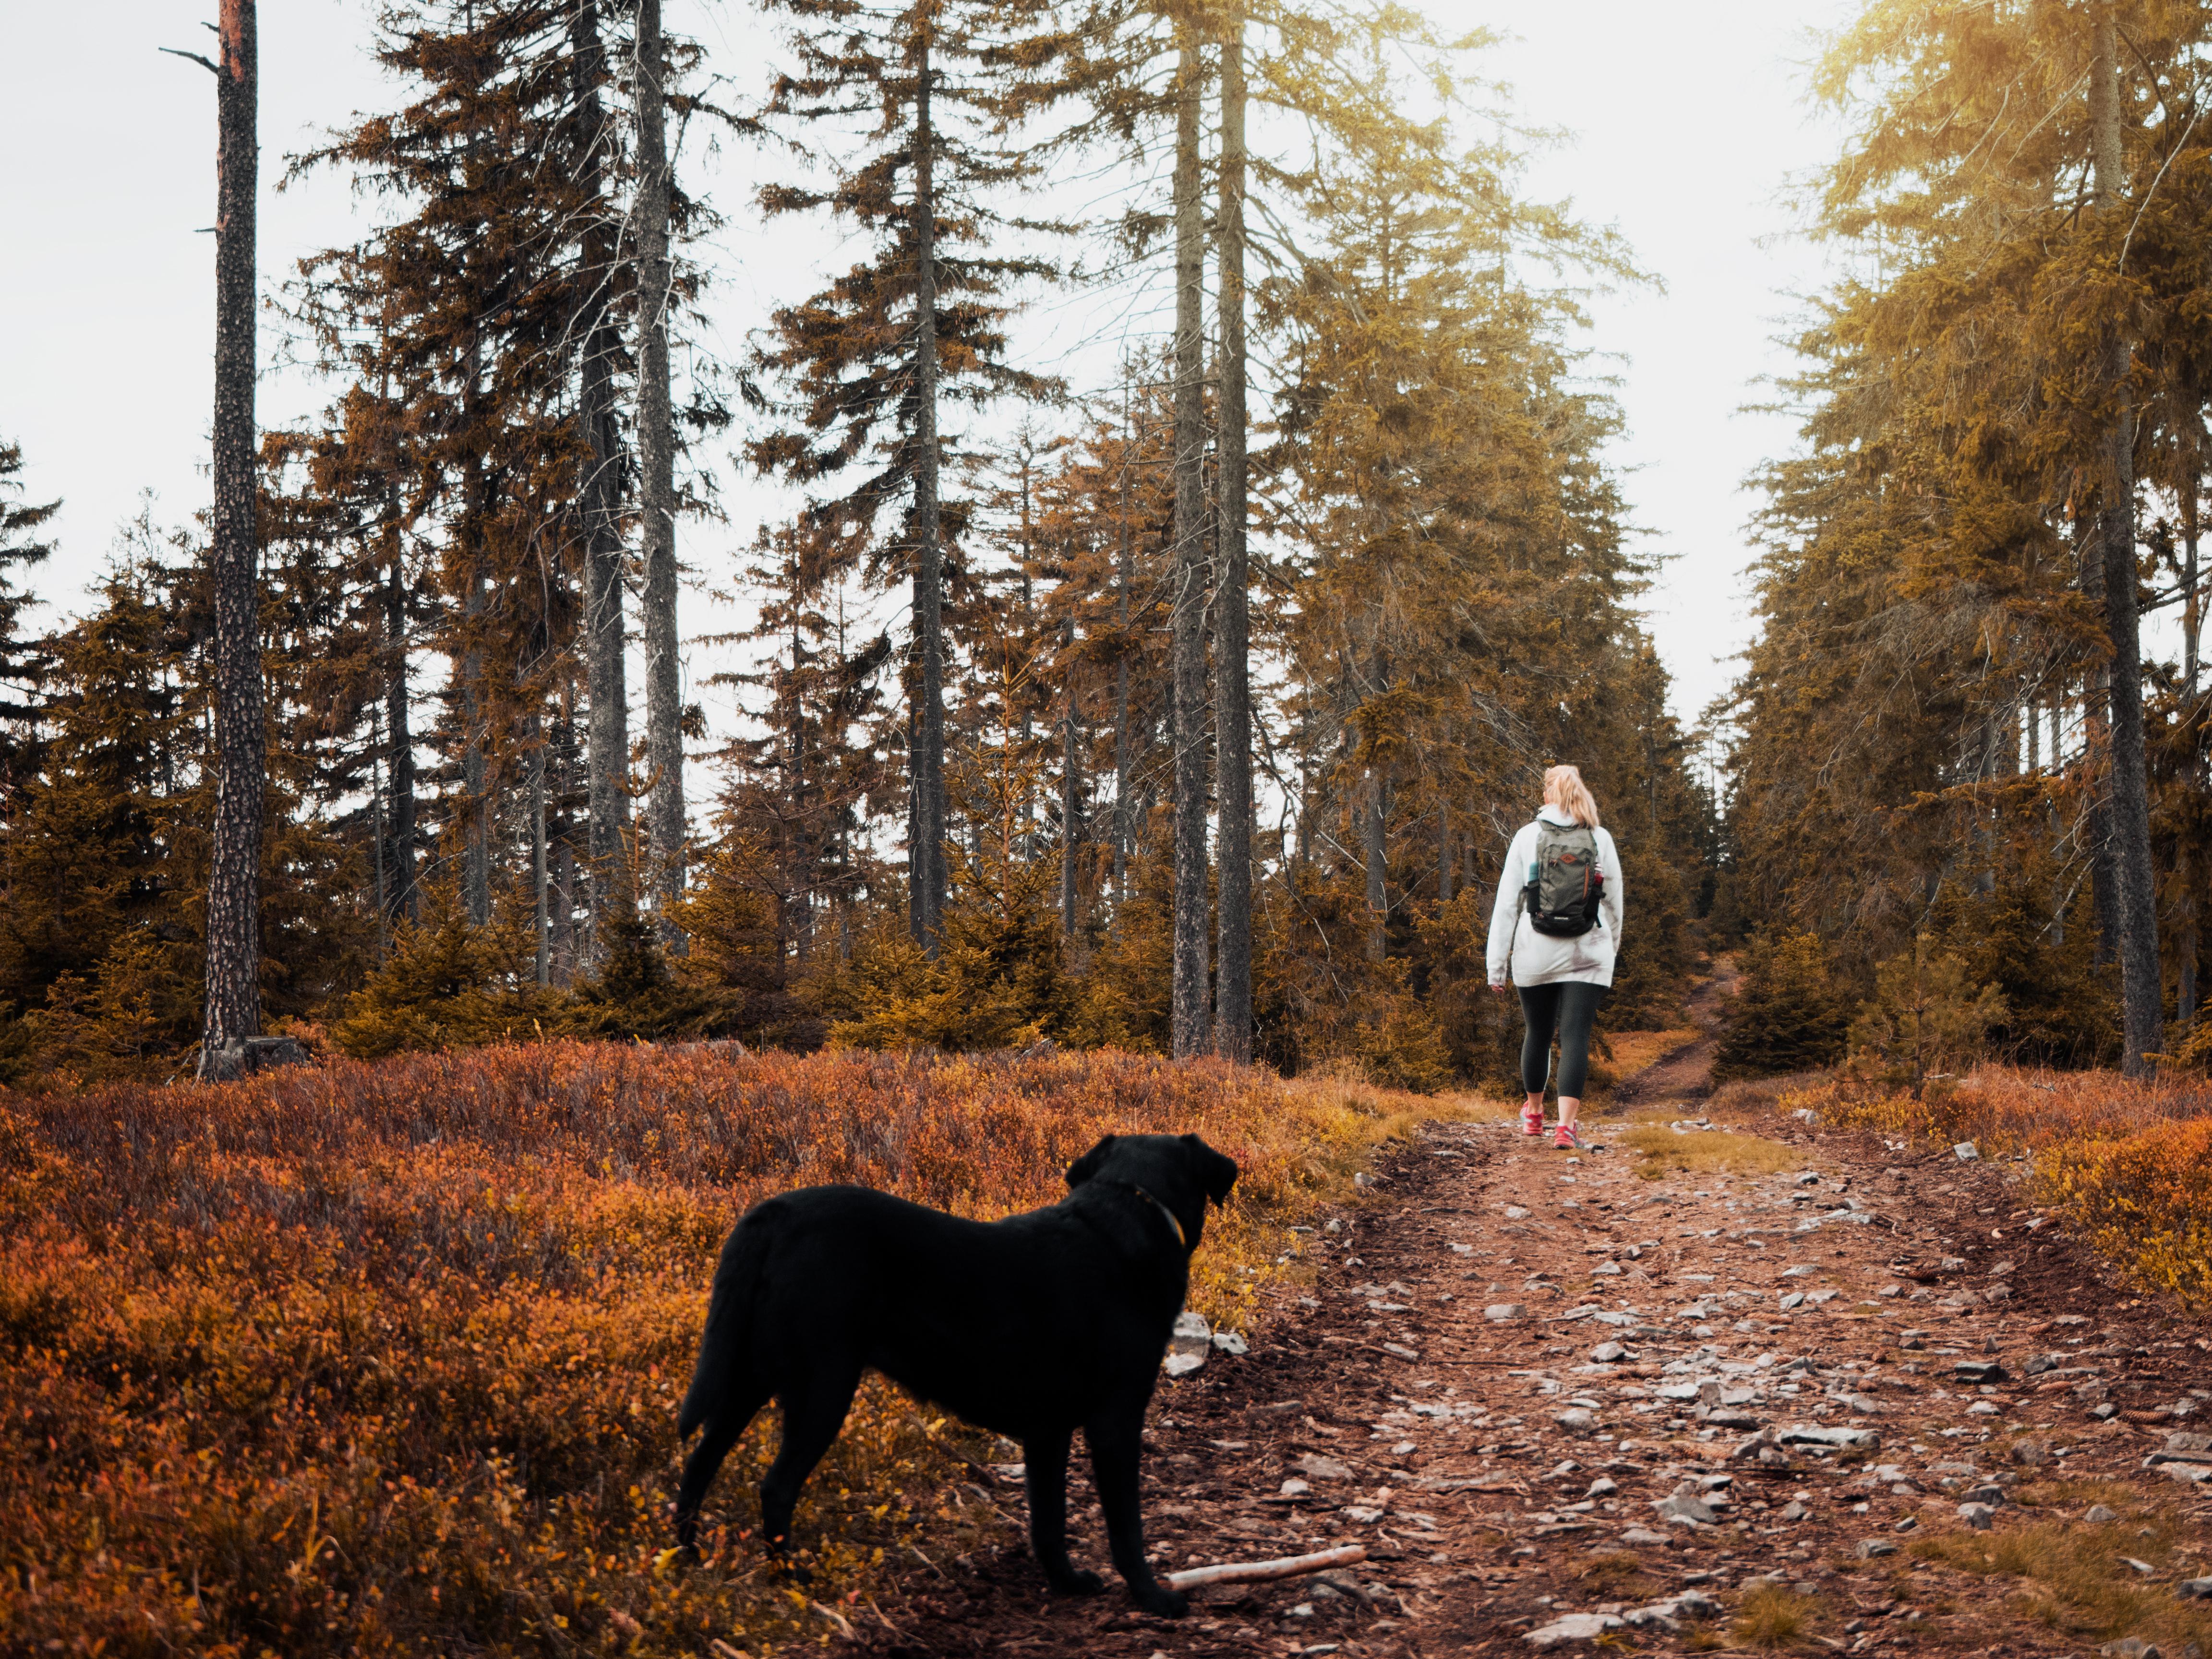 Short-coat Black Dog Standing on Brown Ground